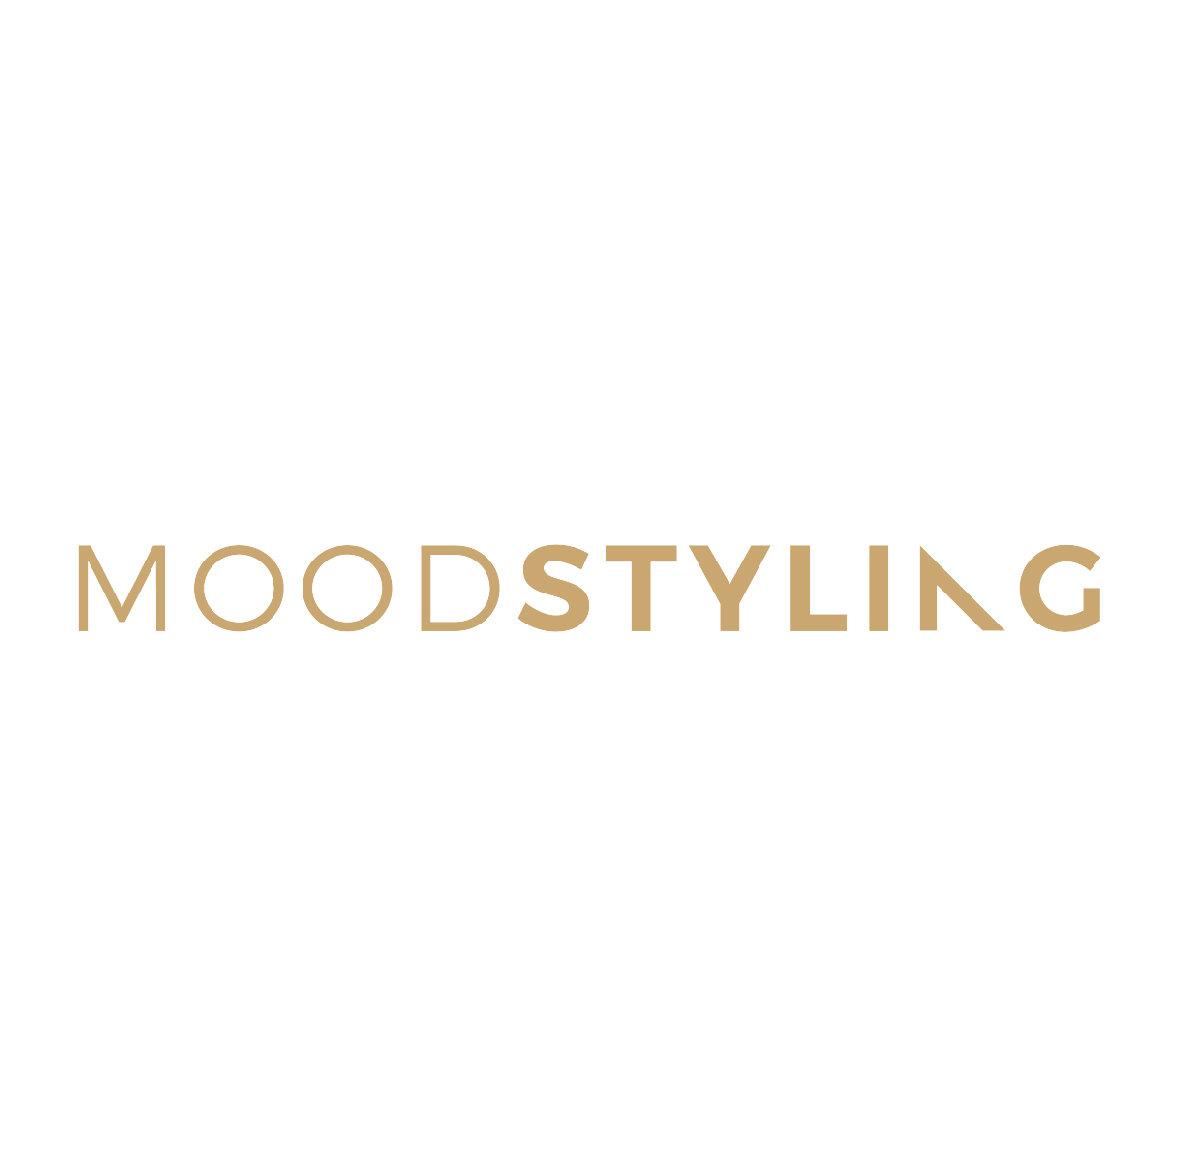 MoodStyling